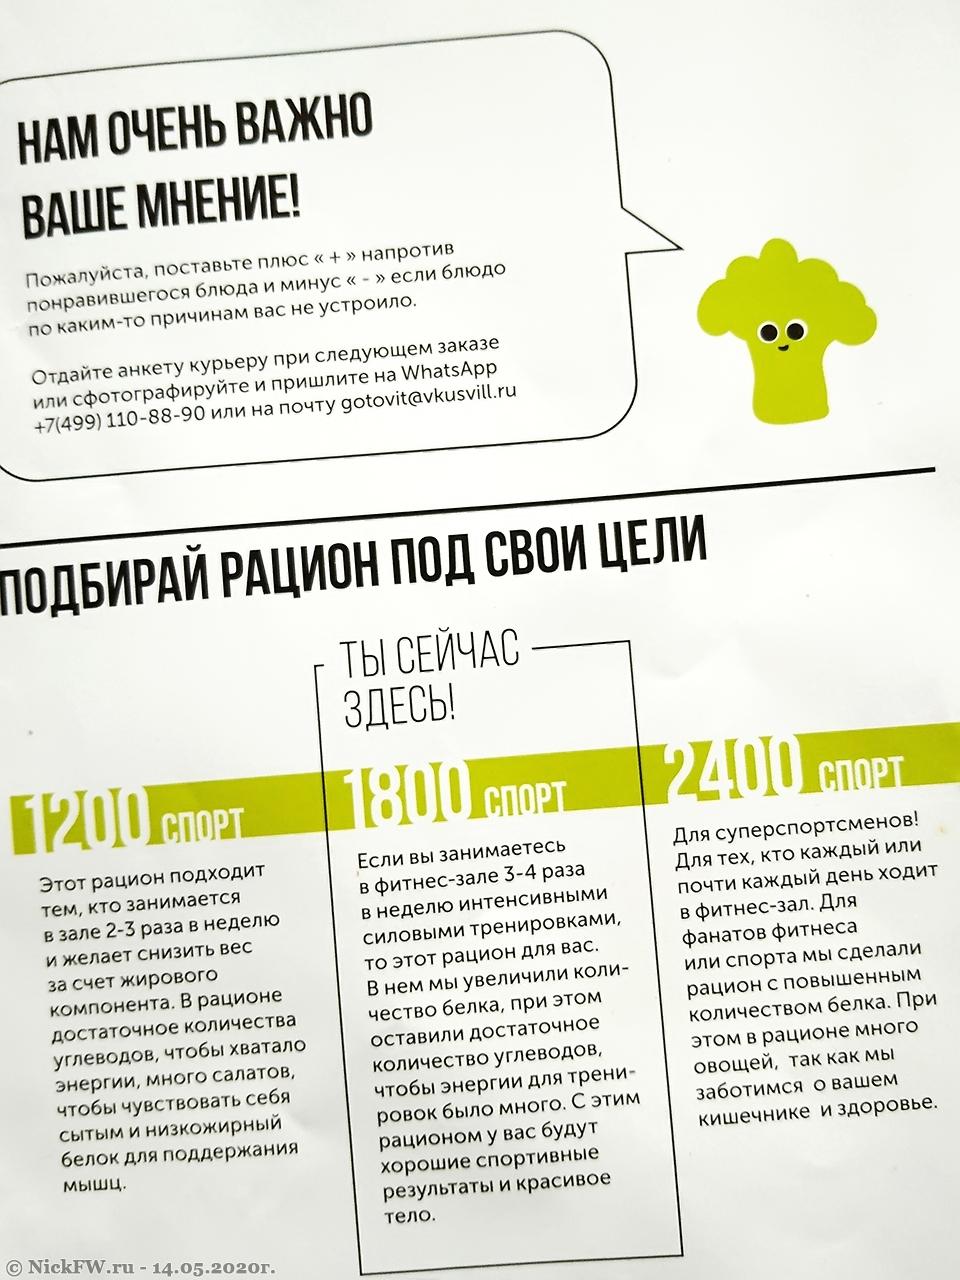 9. Спорт рацион 1800 © NickFW.ru - 14.05.2020г.